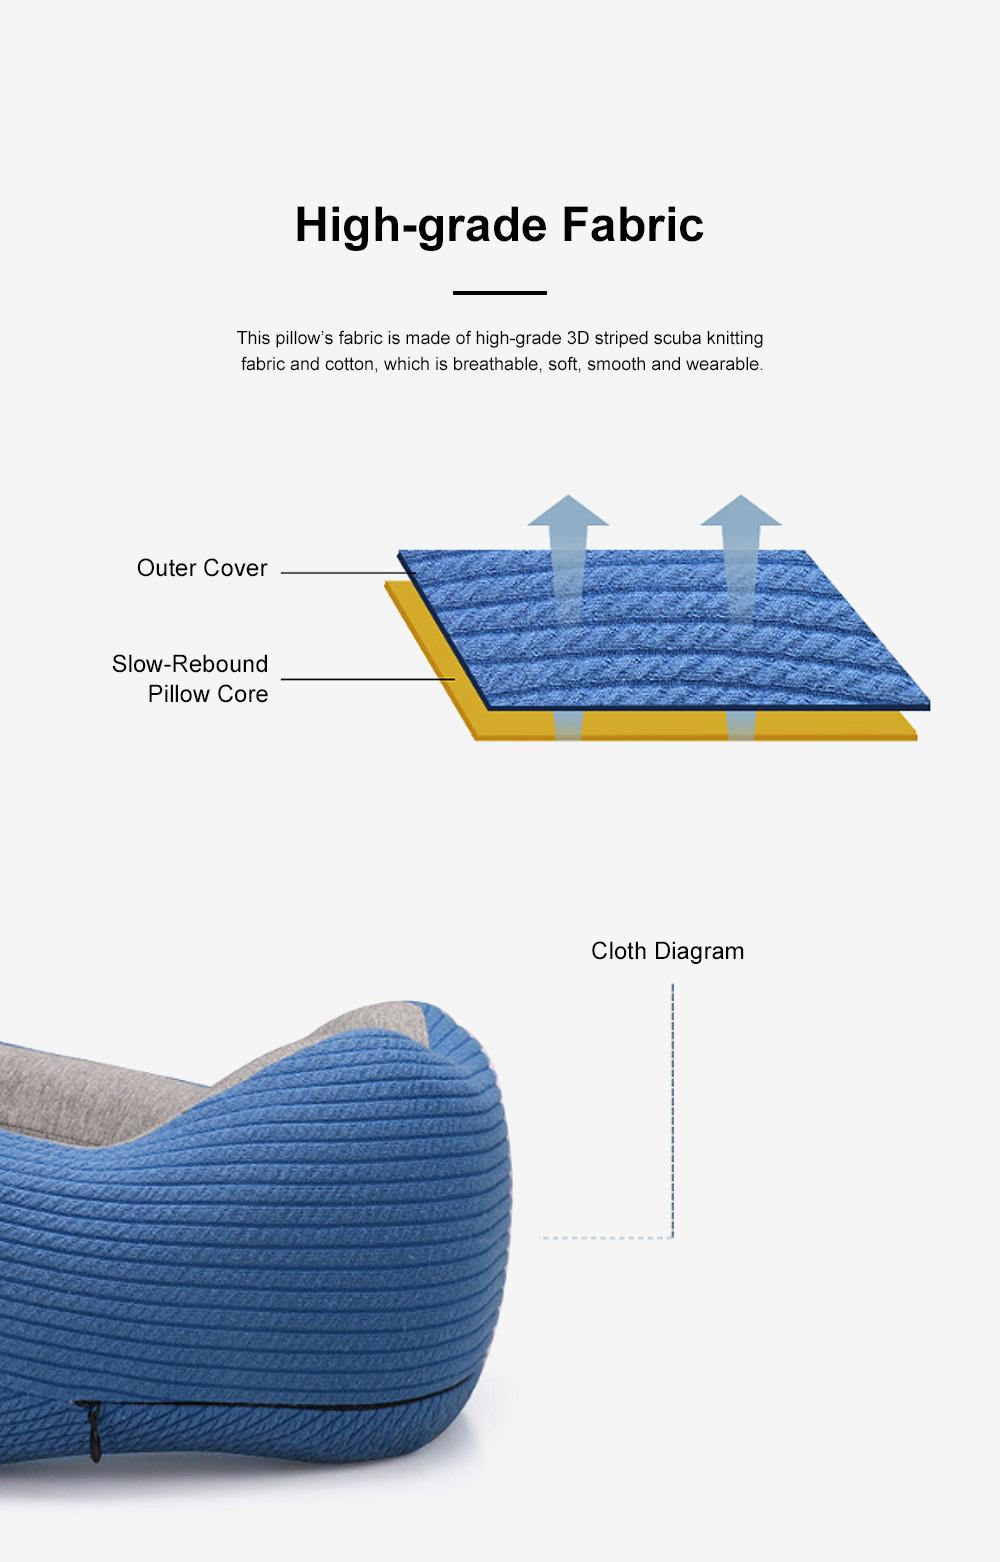 Slow Rebound Memory Foam U-Shaped Soft Pillow, Functional Office School Noon Break Pillow with Adjustable String Buckle 2